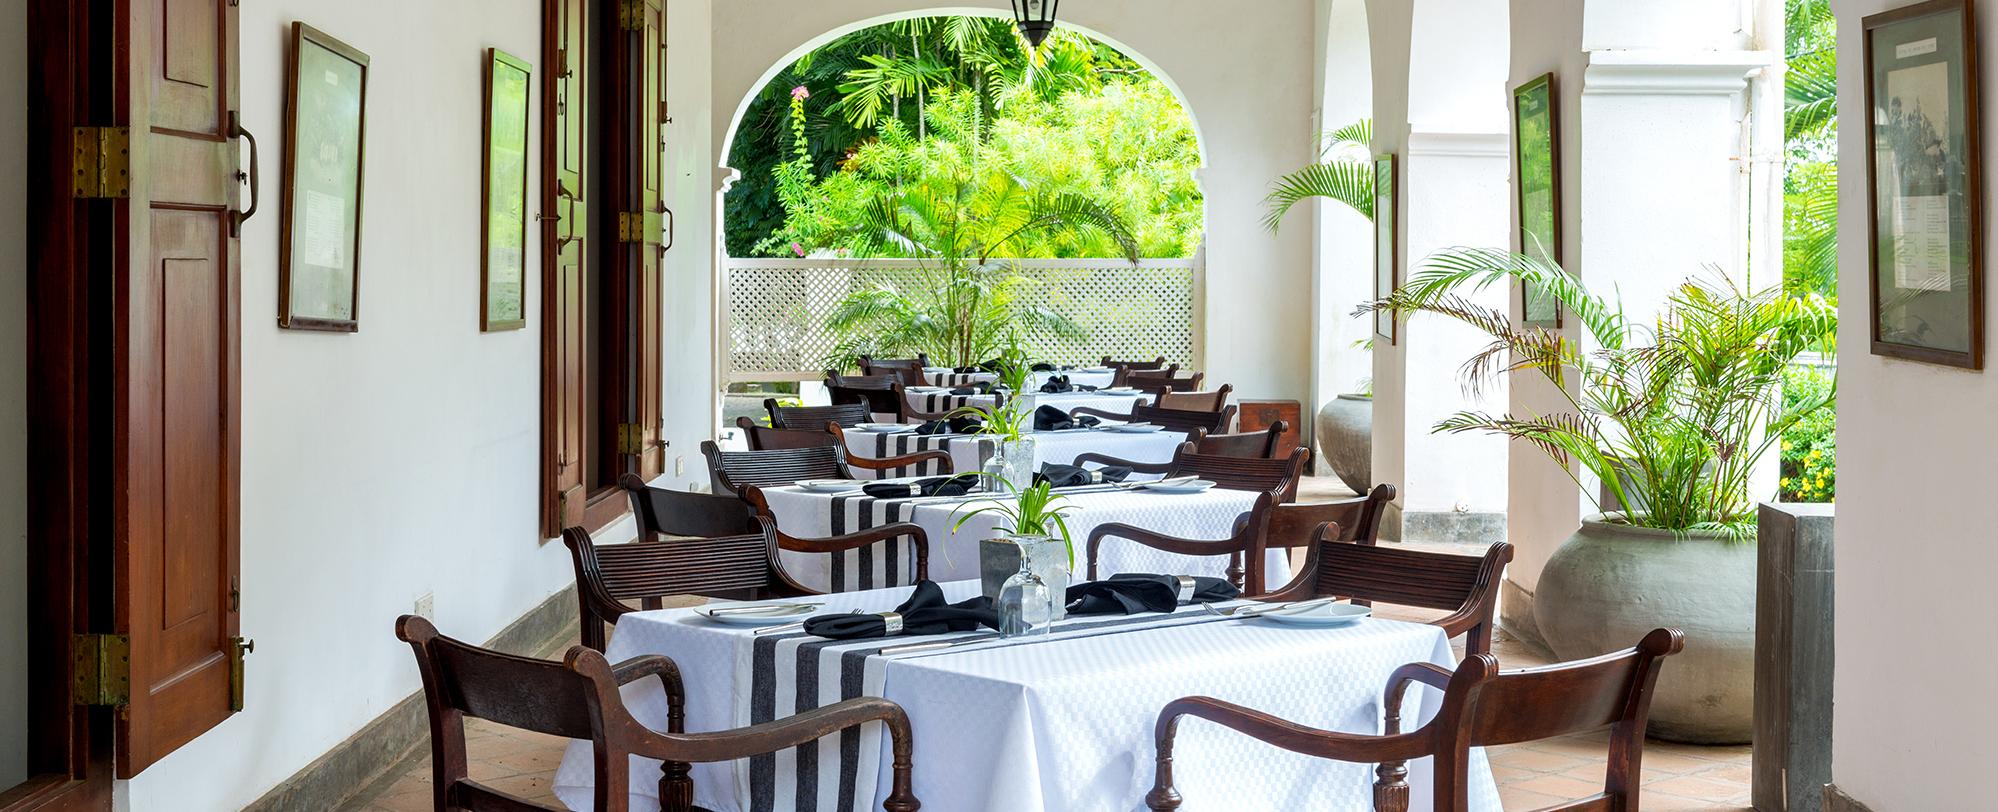 breakfast-terrace-tamarind-hill